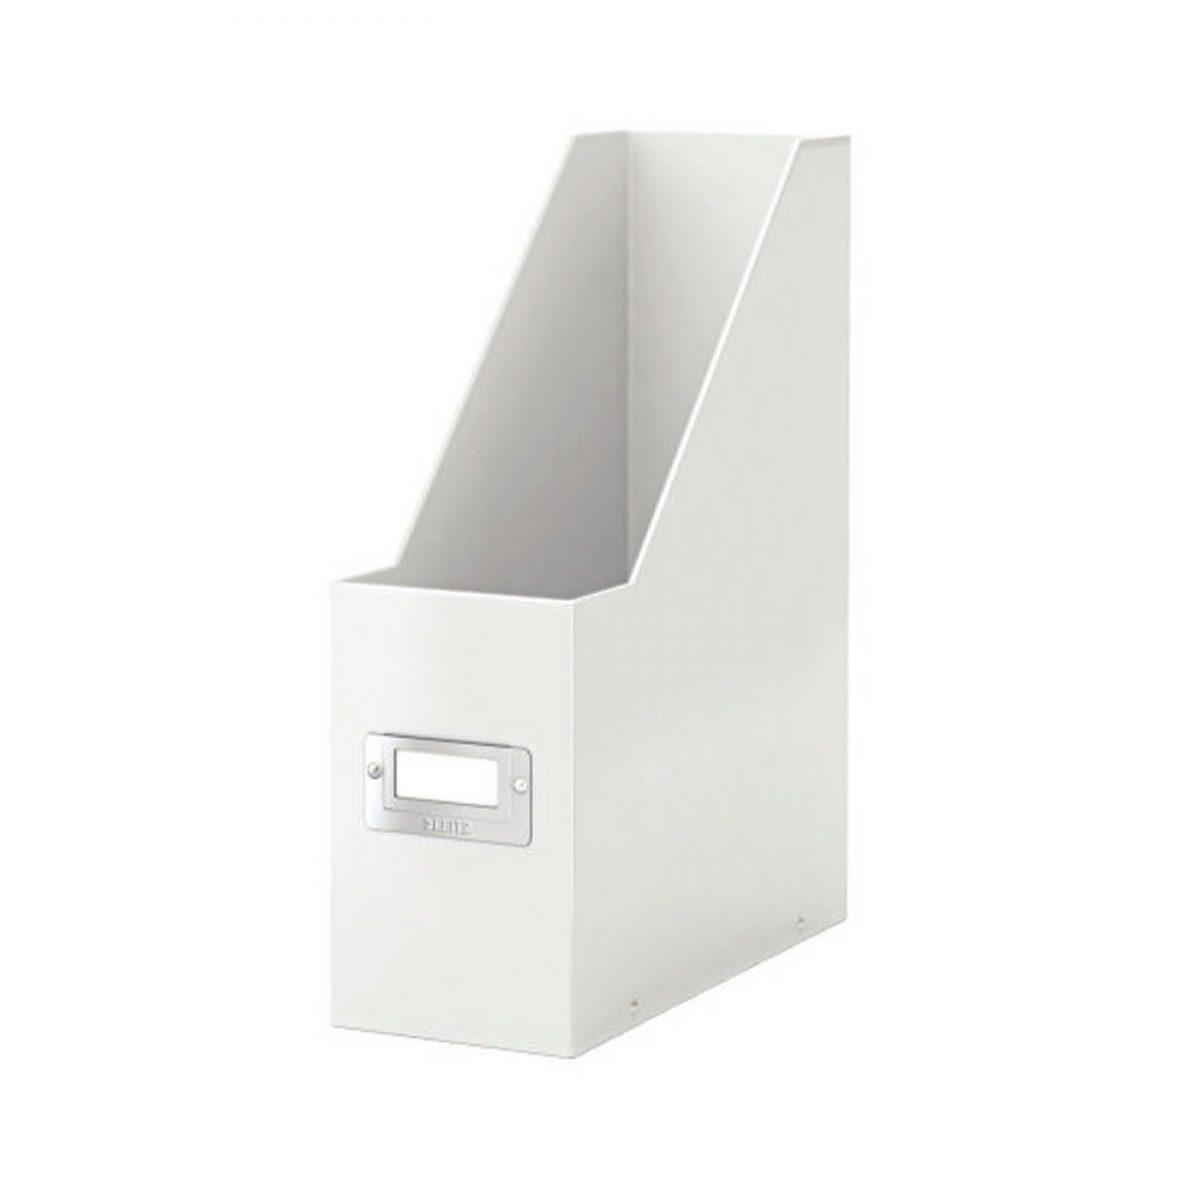 Suport vertical LEITZ Click & Store pentru documente, carton laminat - alb